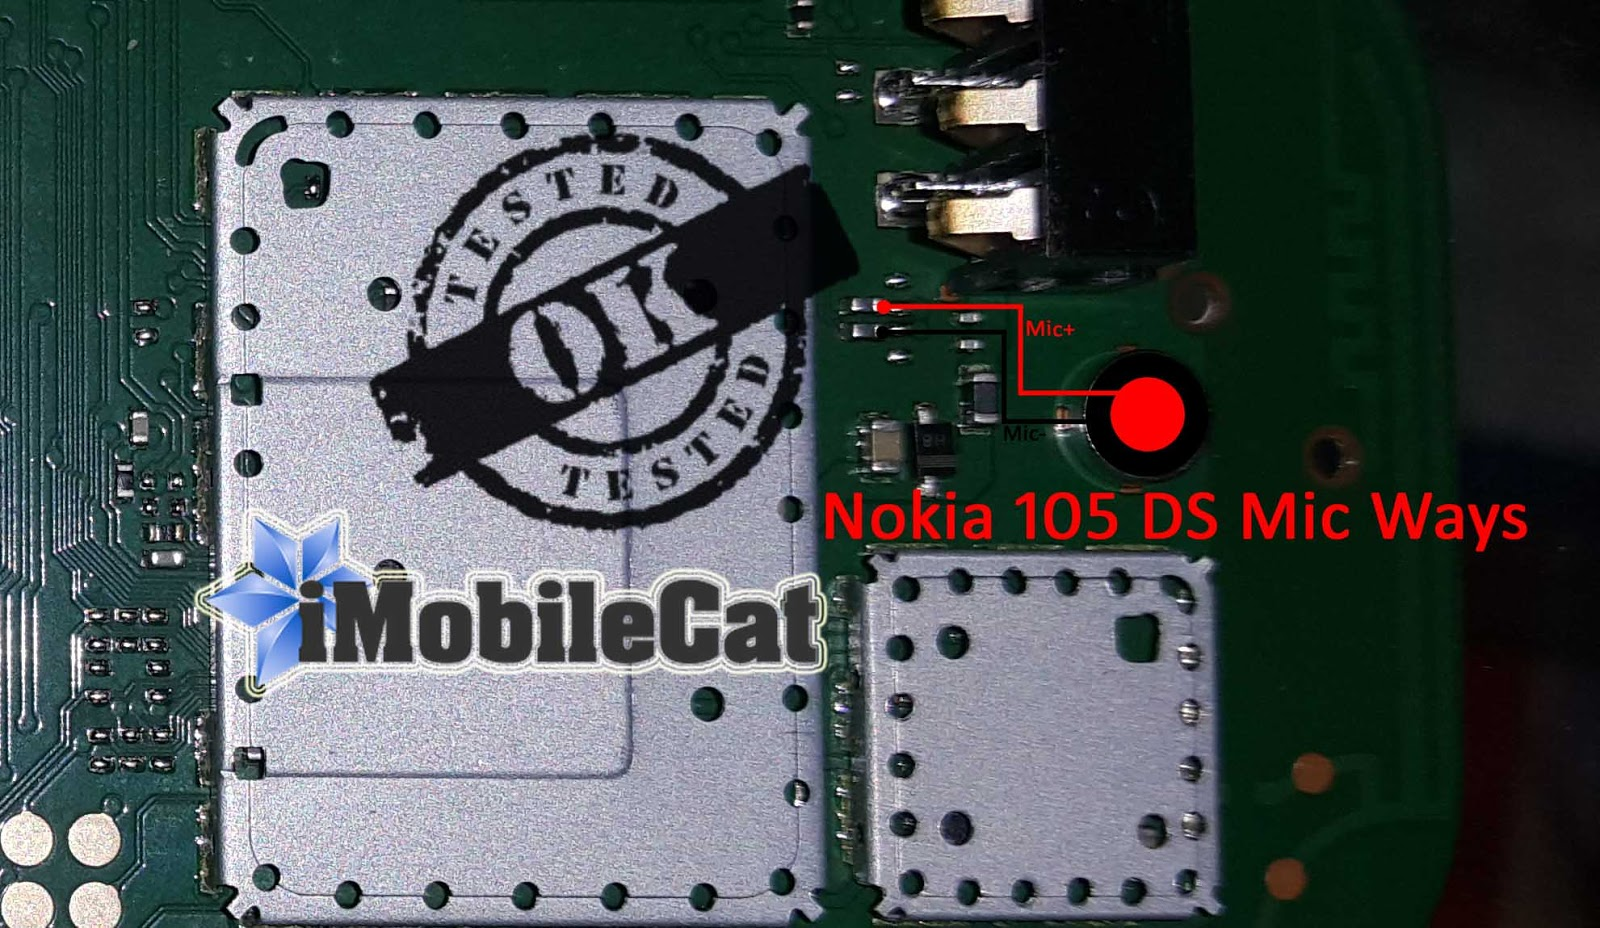 Nokia 105 dual sim charging solution 5 9 9  Сlick